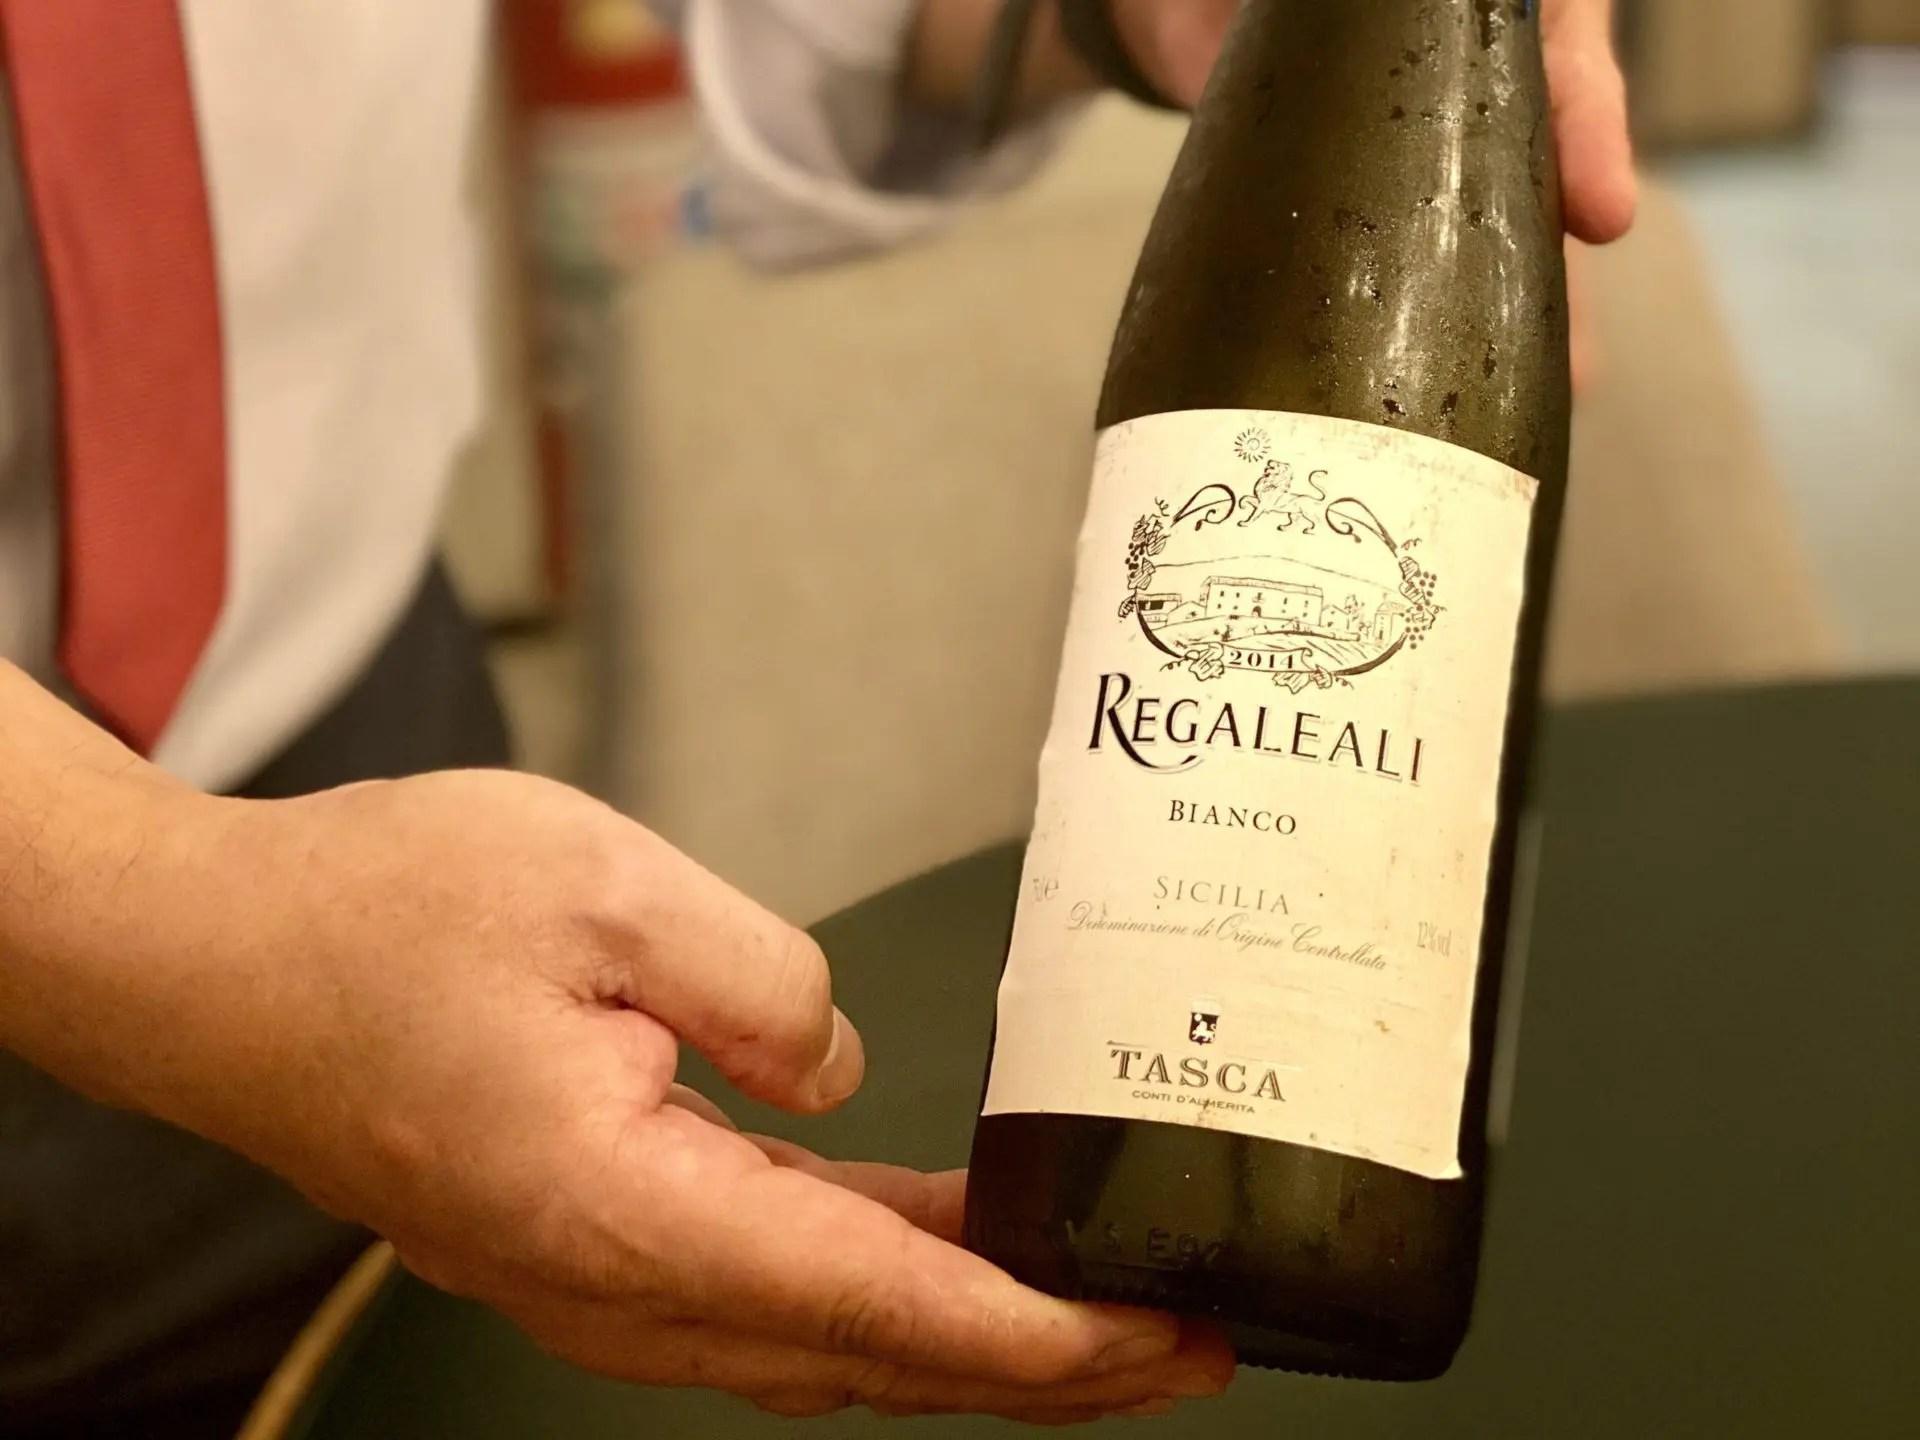 Grand Mercure sp Itaim Bibi vinho branco regaleali